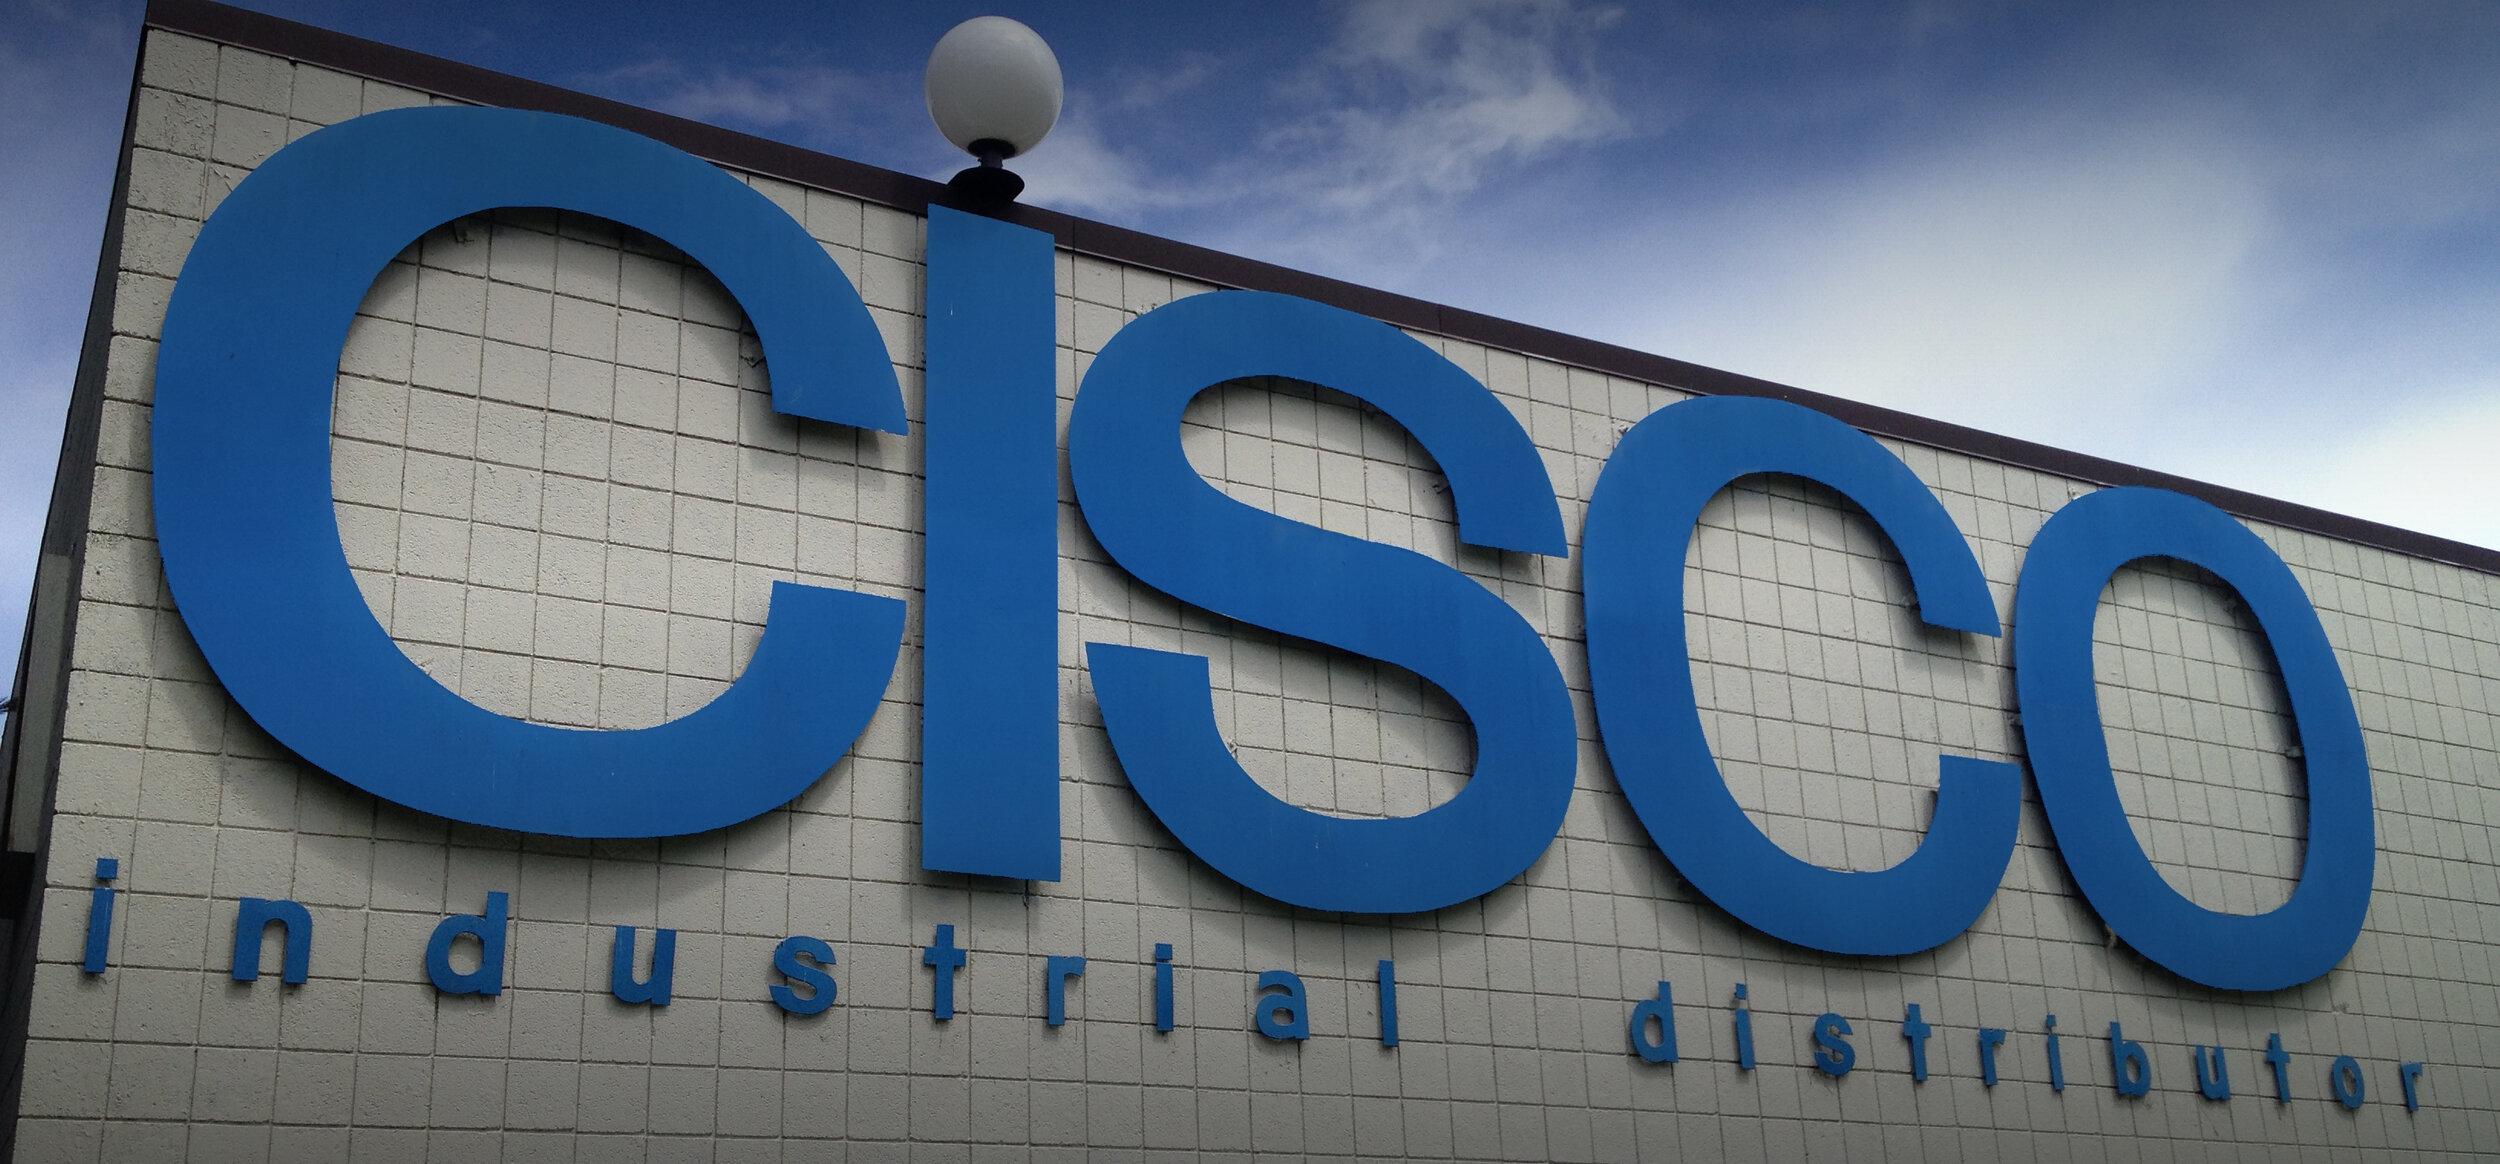 CISCO Building.JPG